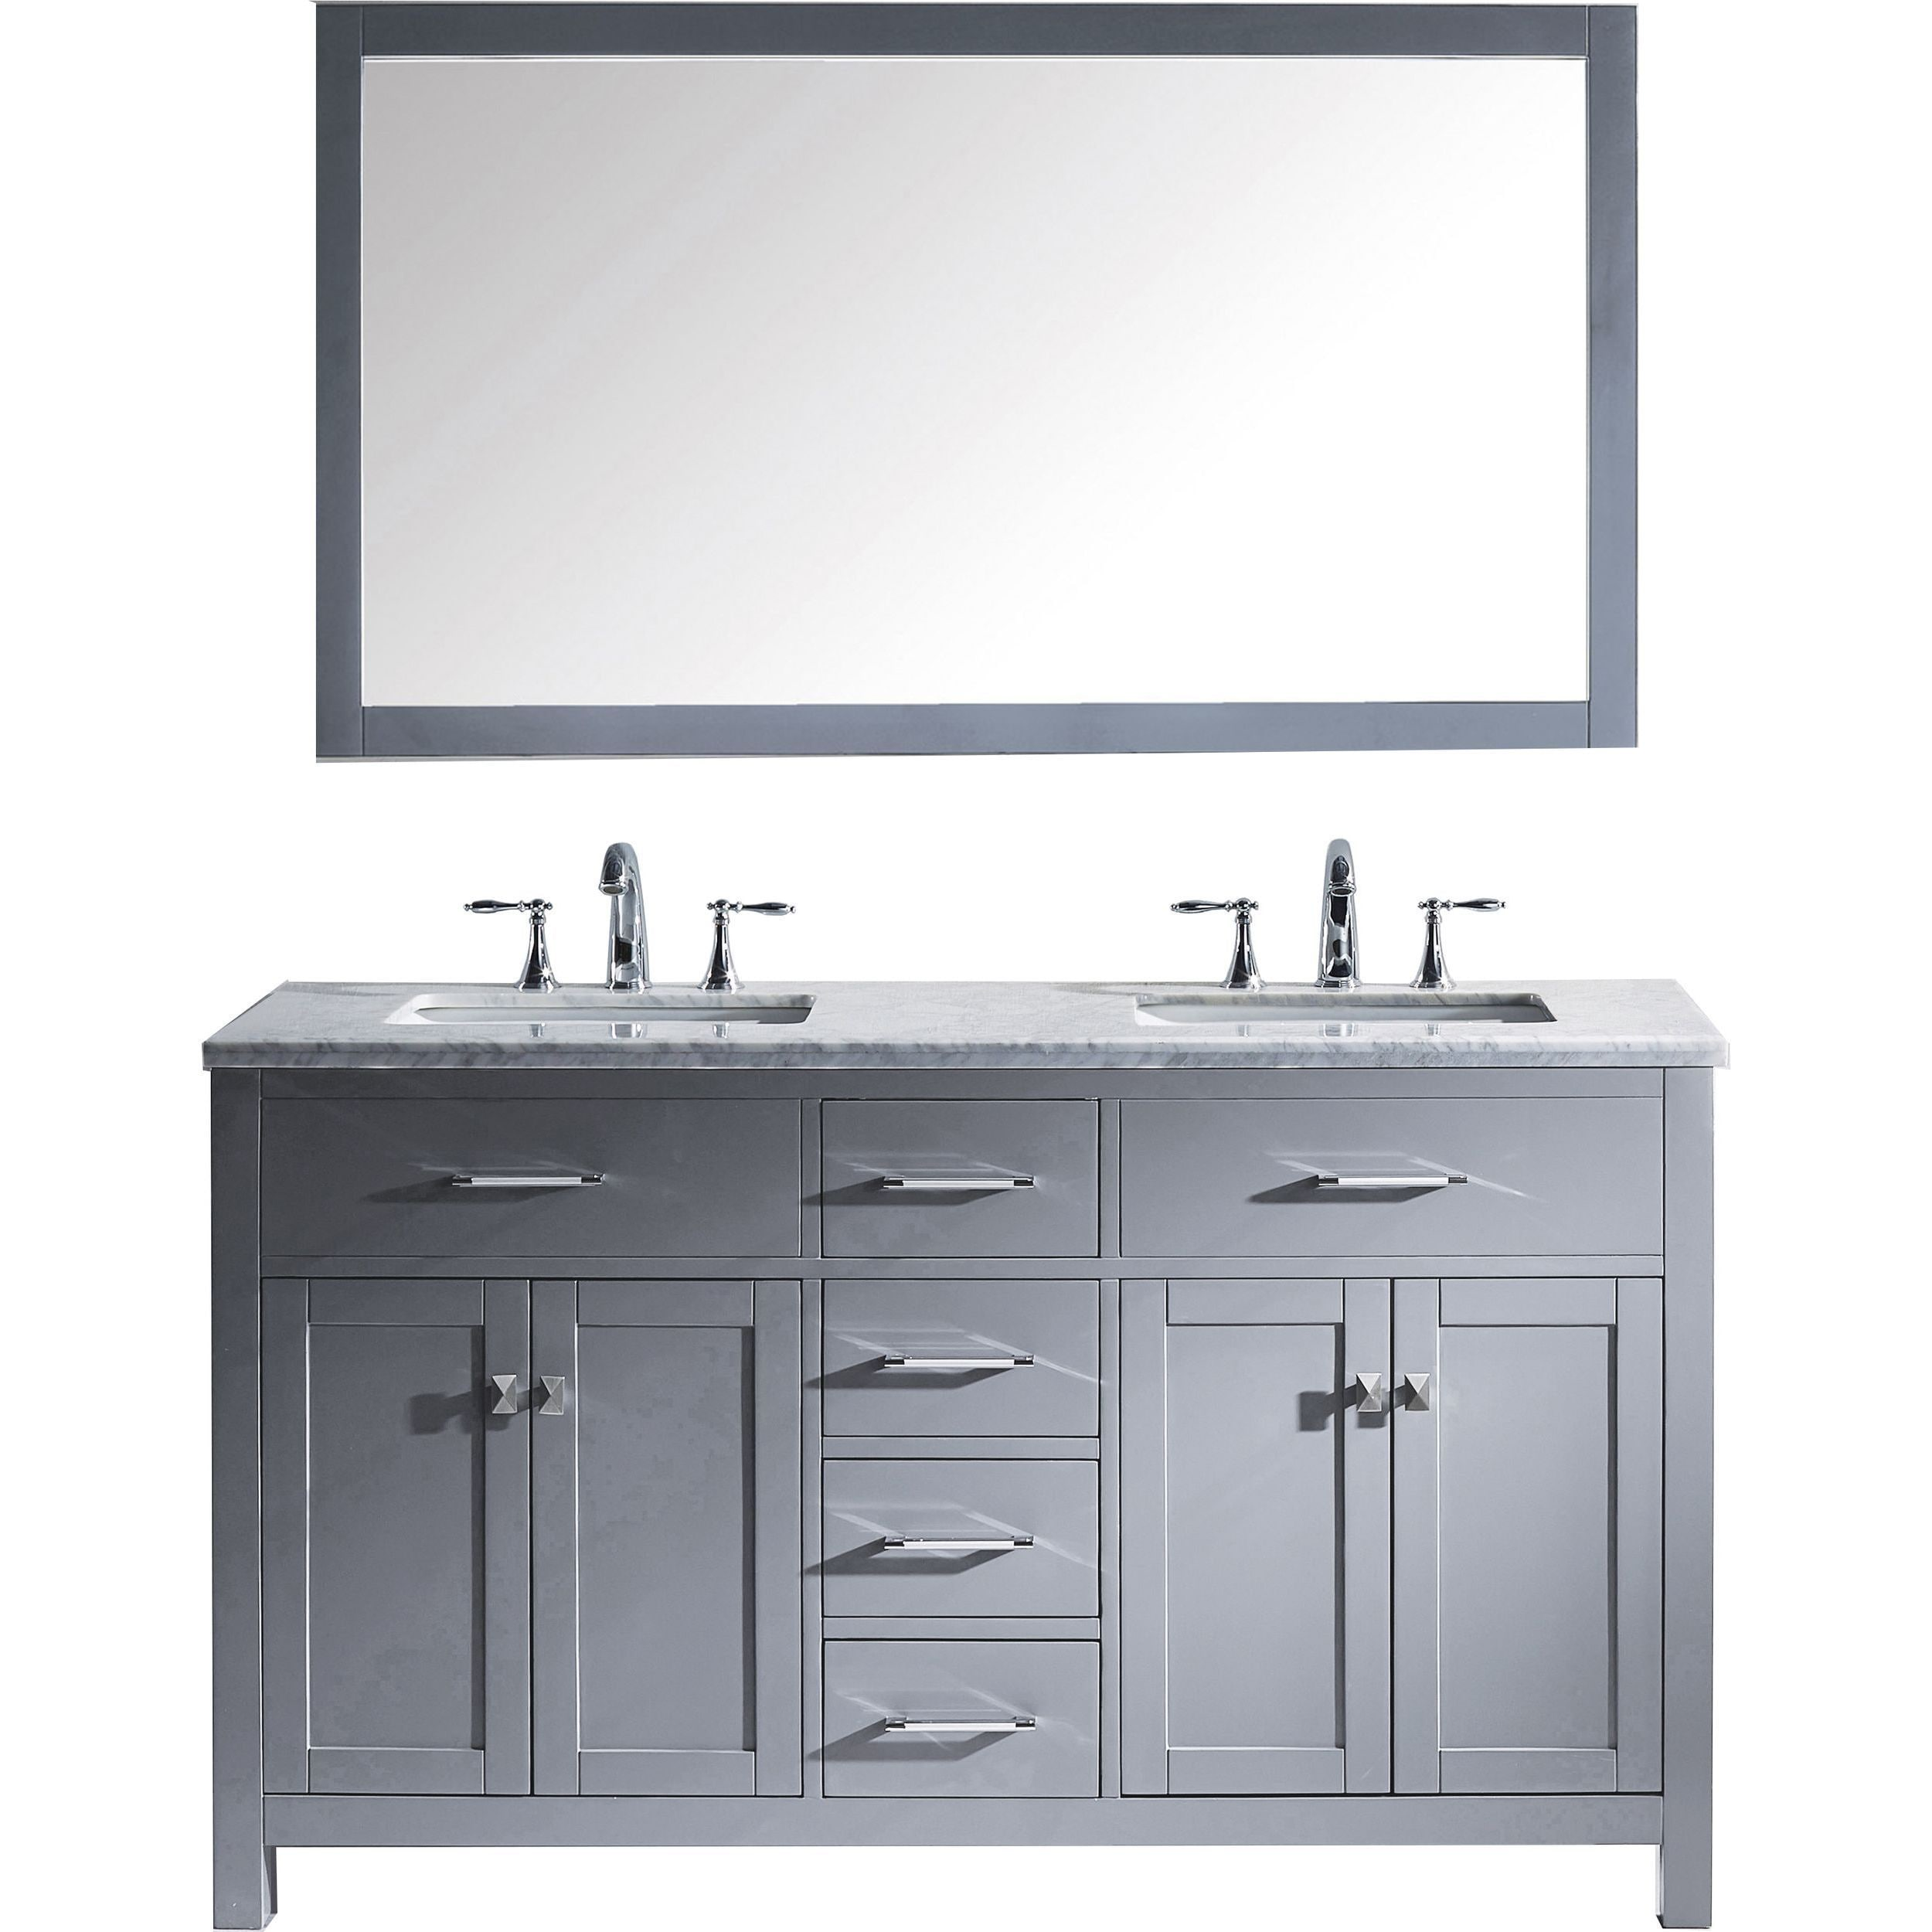 Virtu Usa Caroline 60 Inch Carrara White Marble Double Bathroom Vanity Set With Ebay